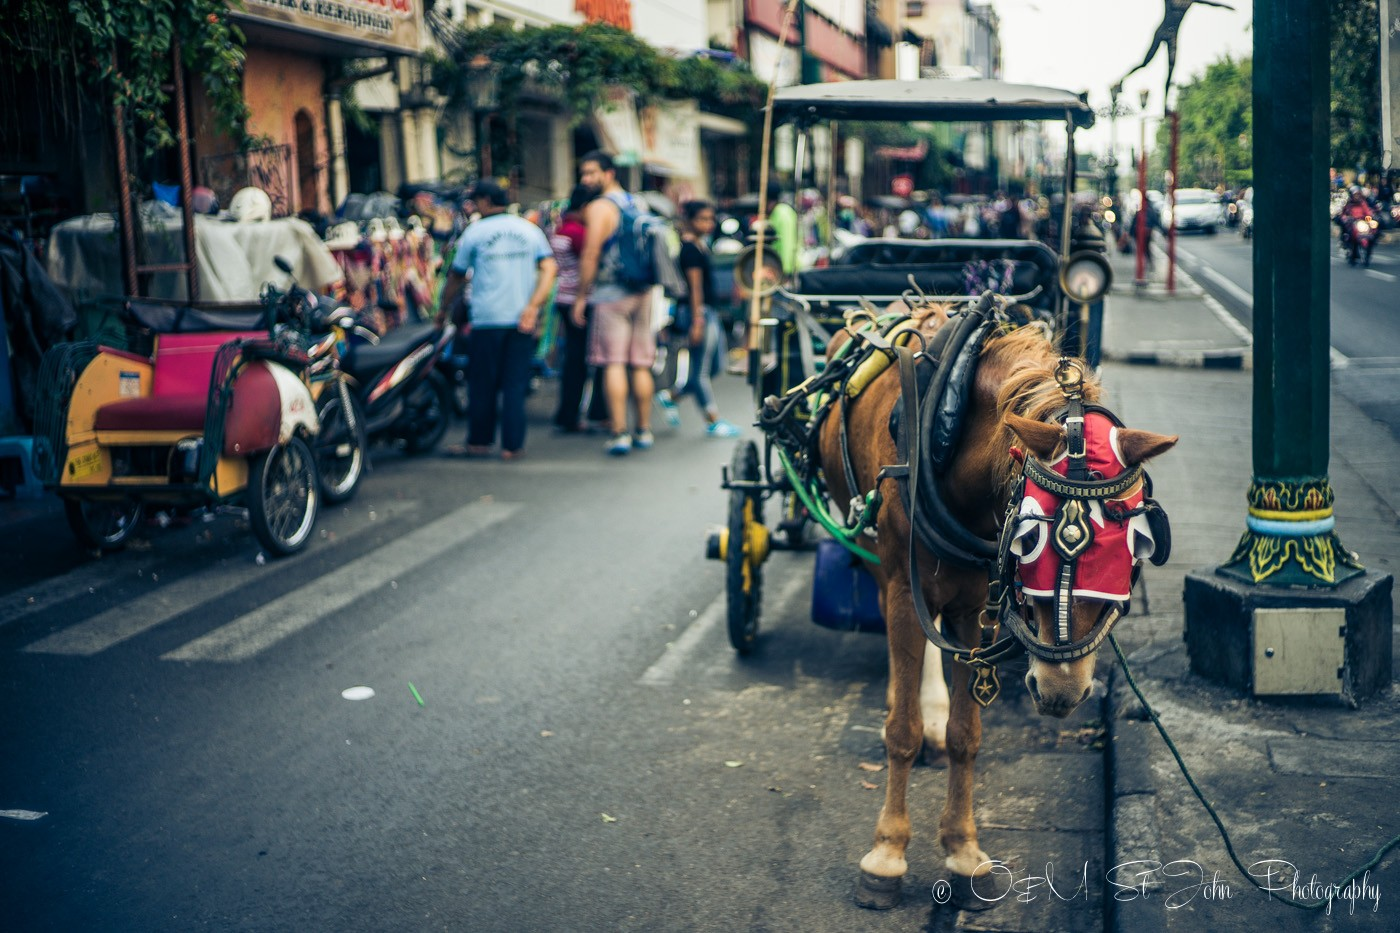 Yogyakarta attractions: Horse carriage on Jalan Malioboro